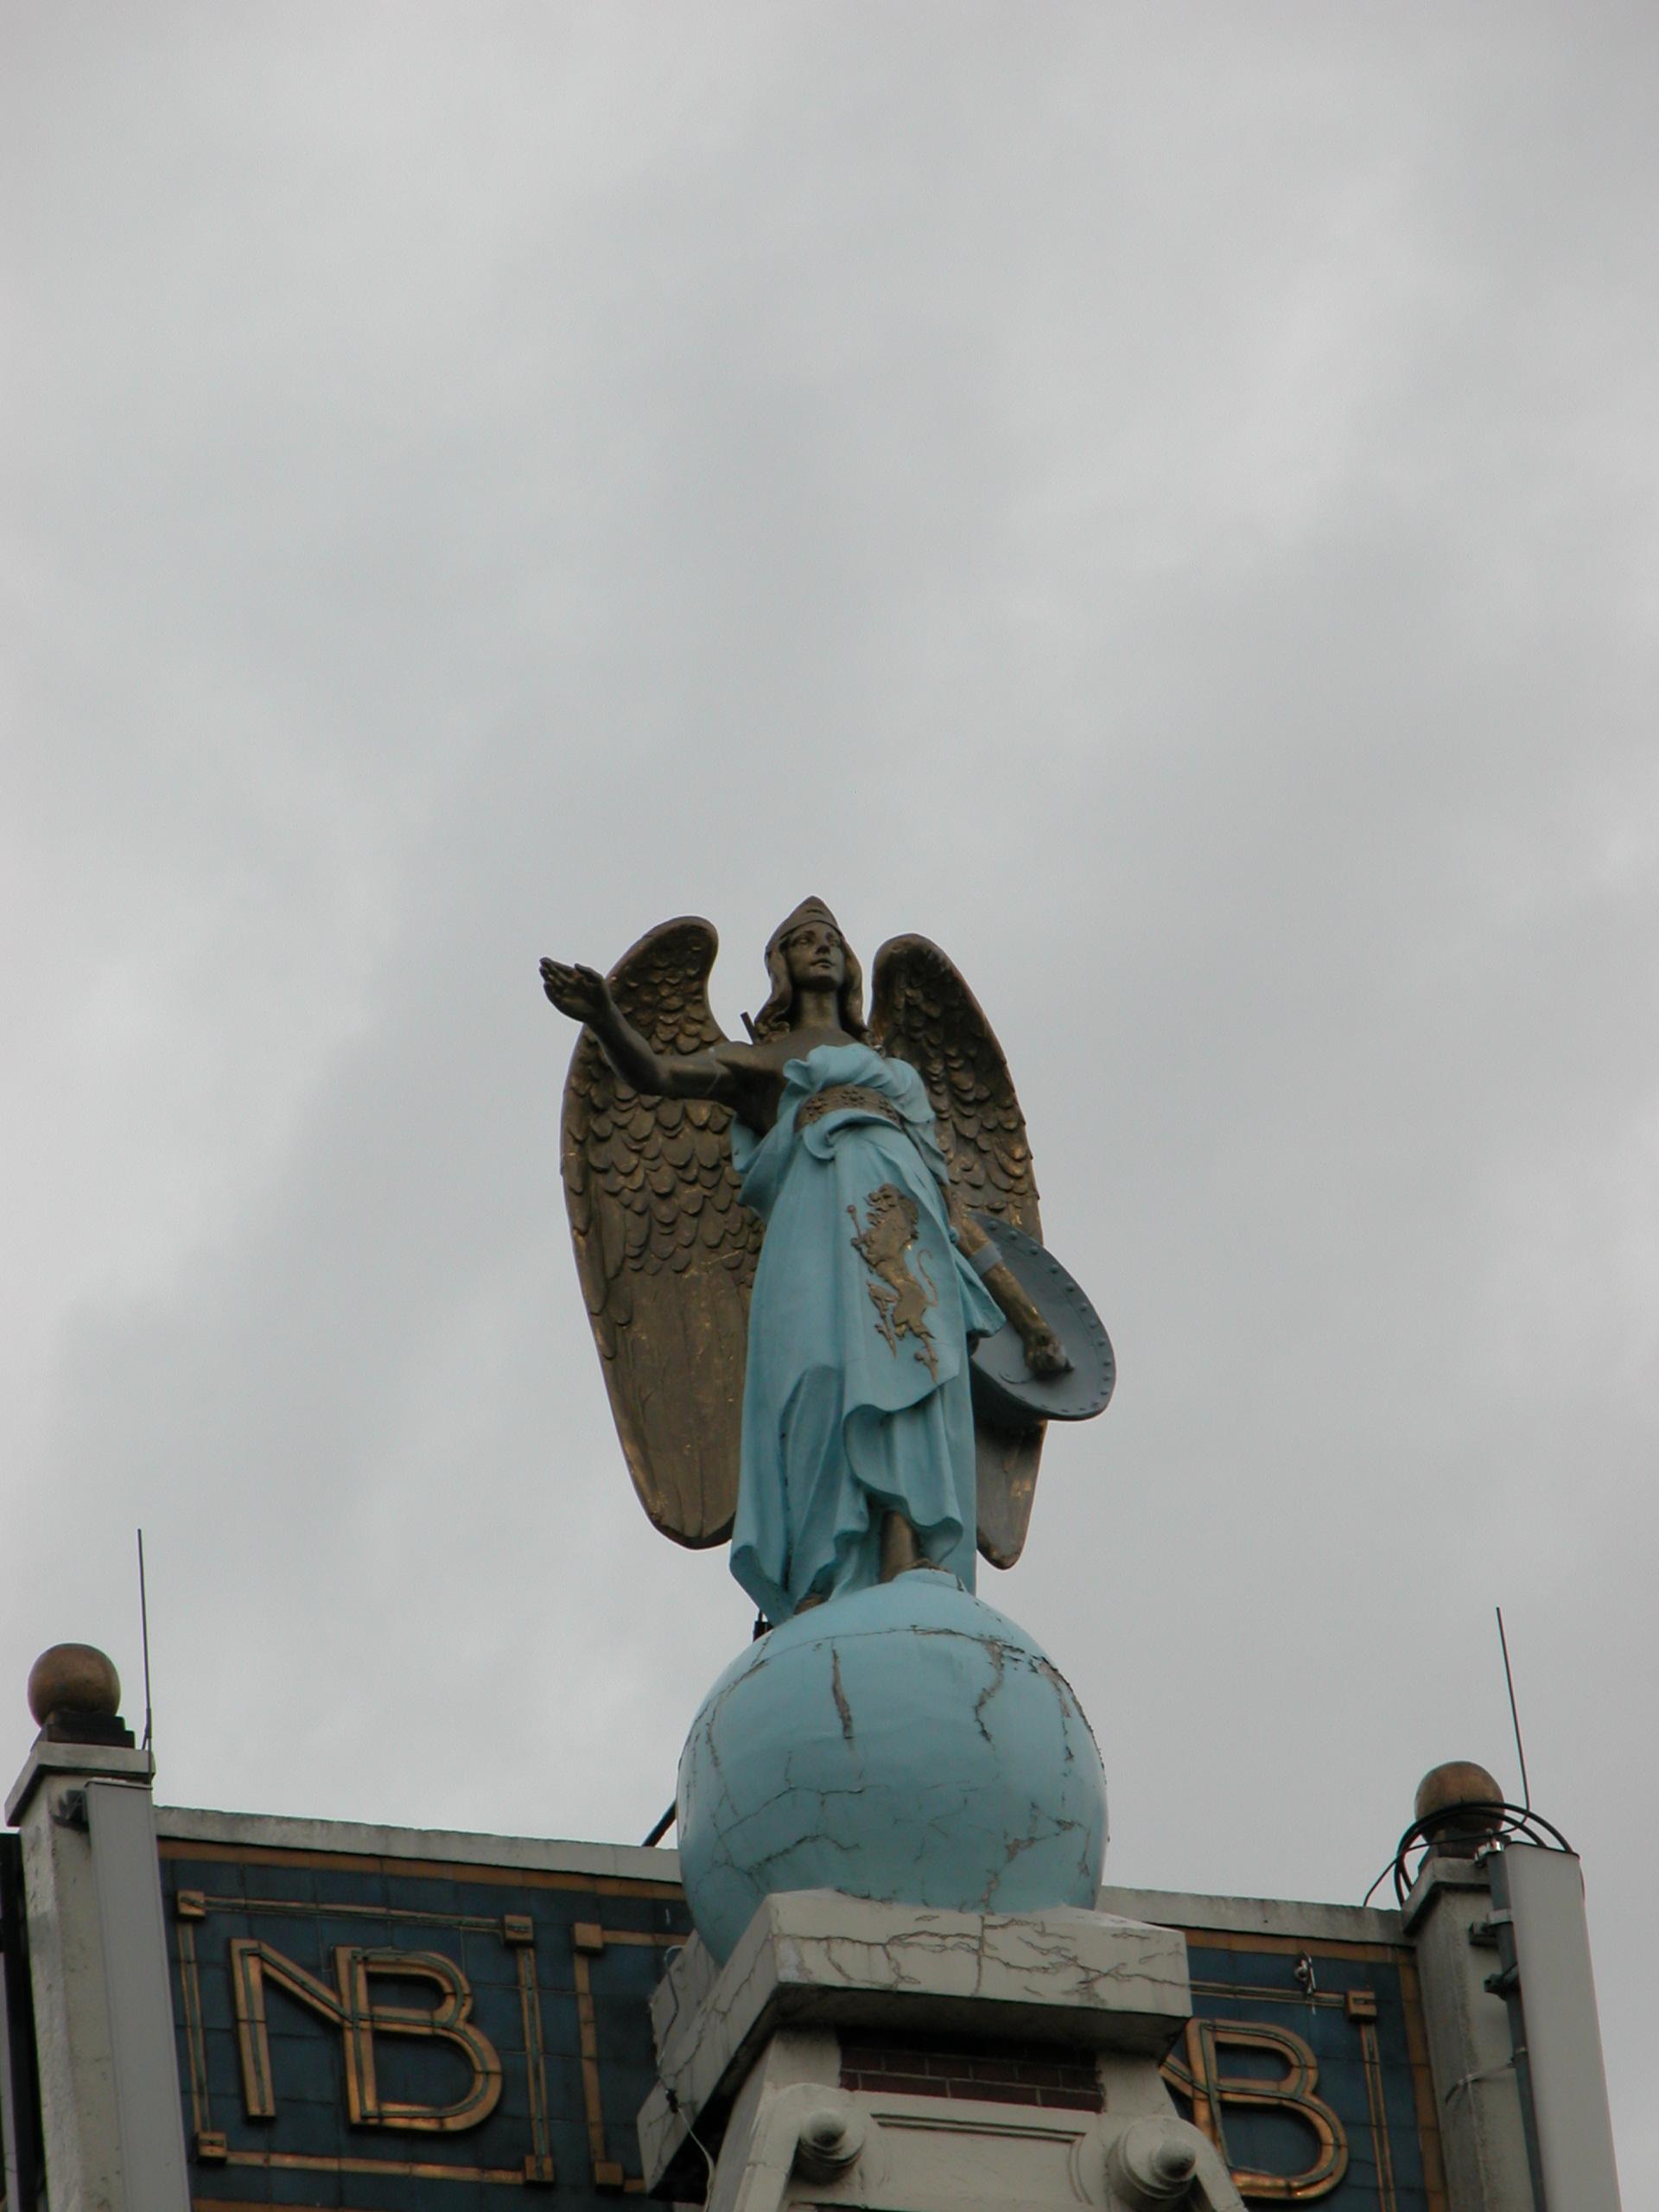 art sculptures angel amsterdam statue